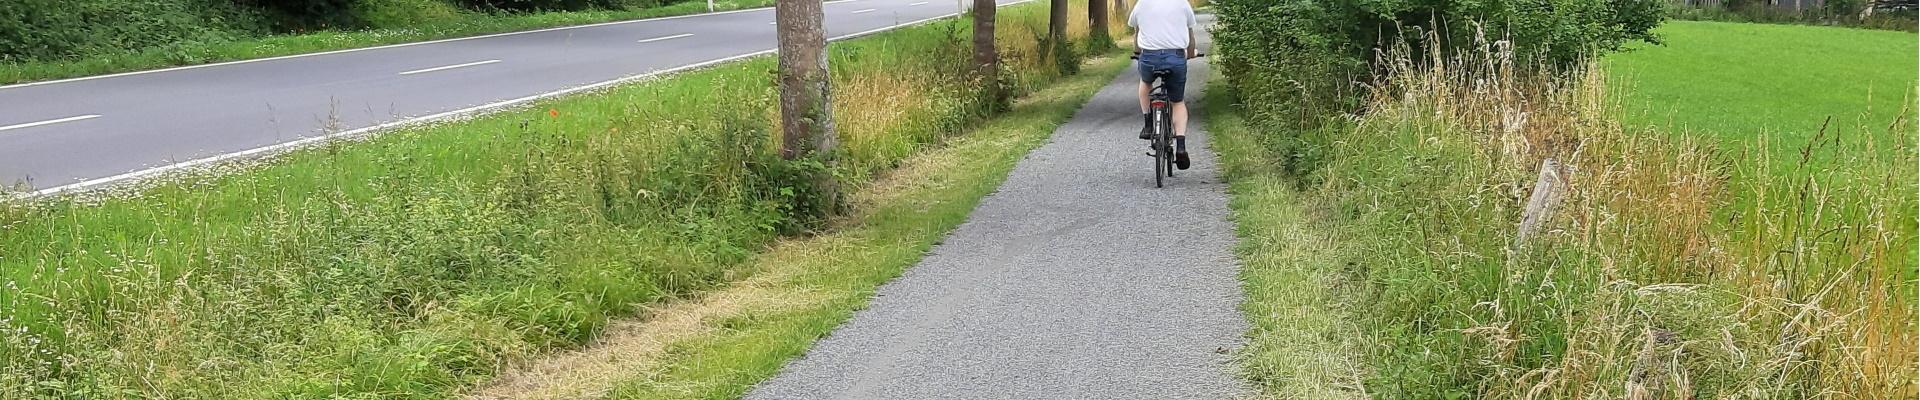 BikeLane Radweg-Projekt